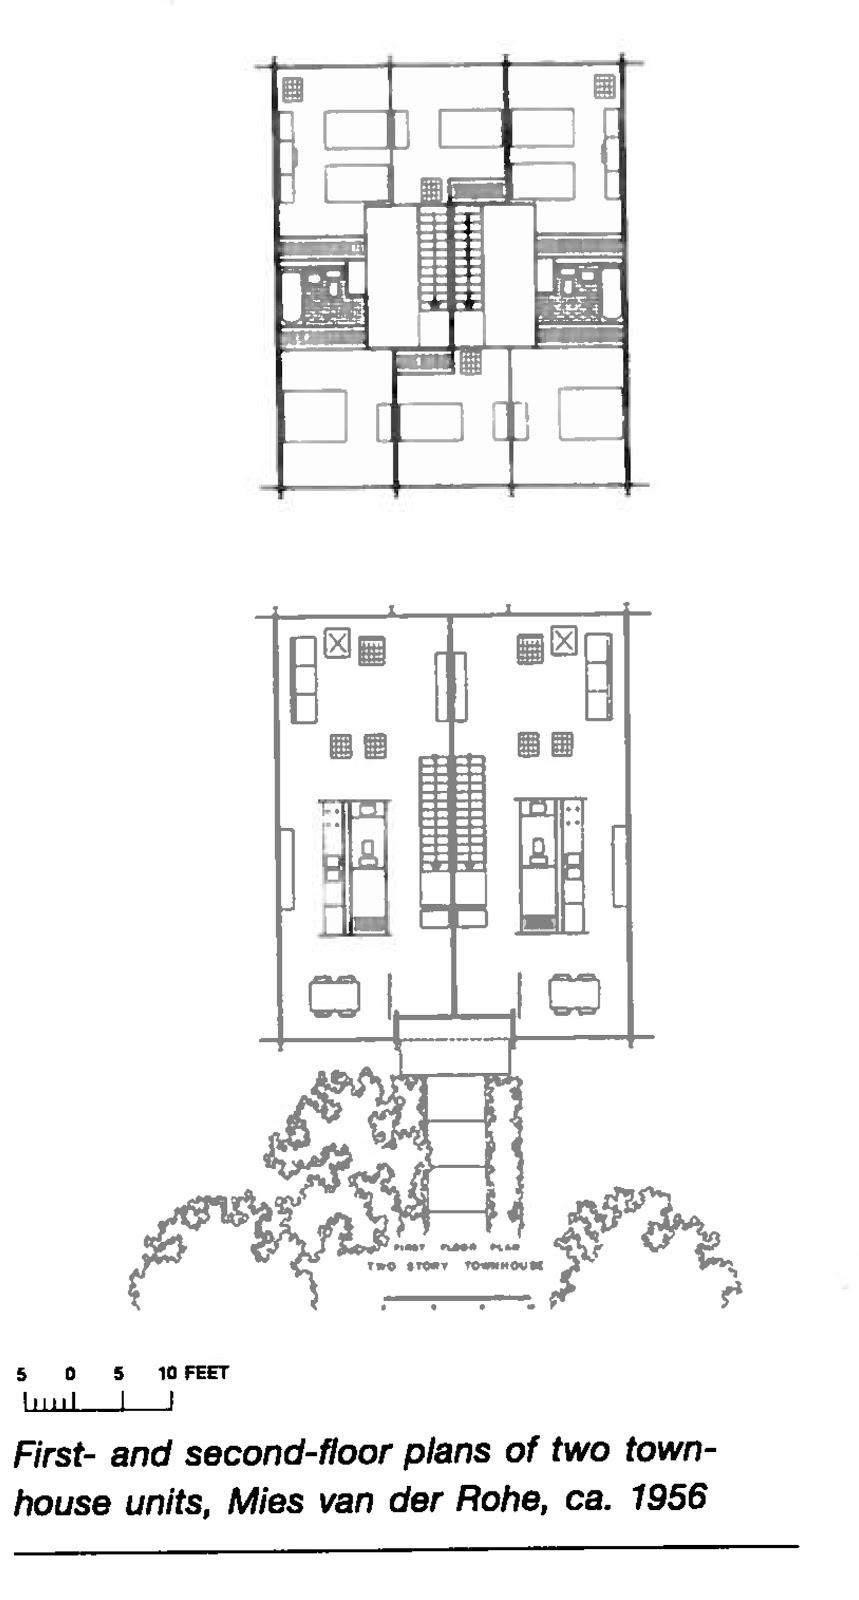 Bim detroit research week lafayette park urban for Urban townhouse floor plans